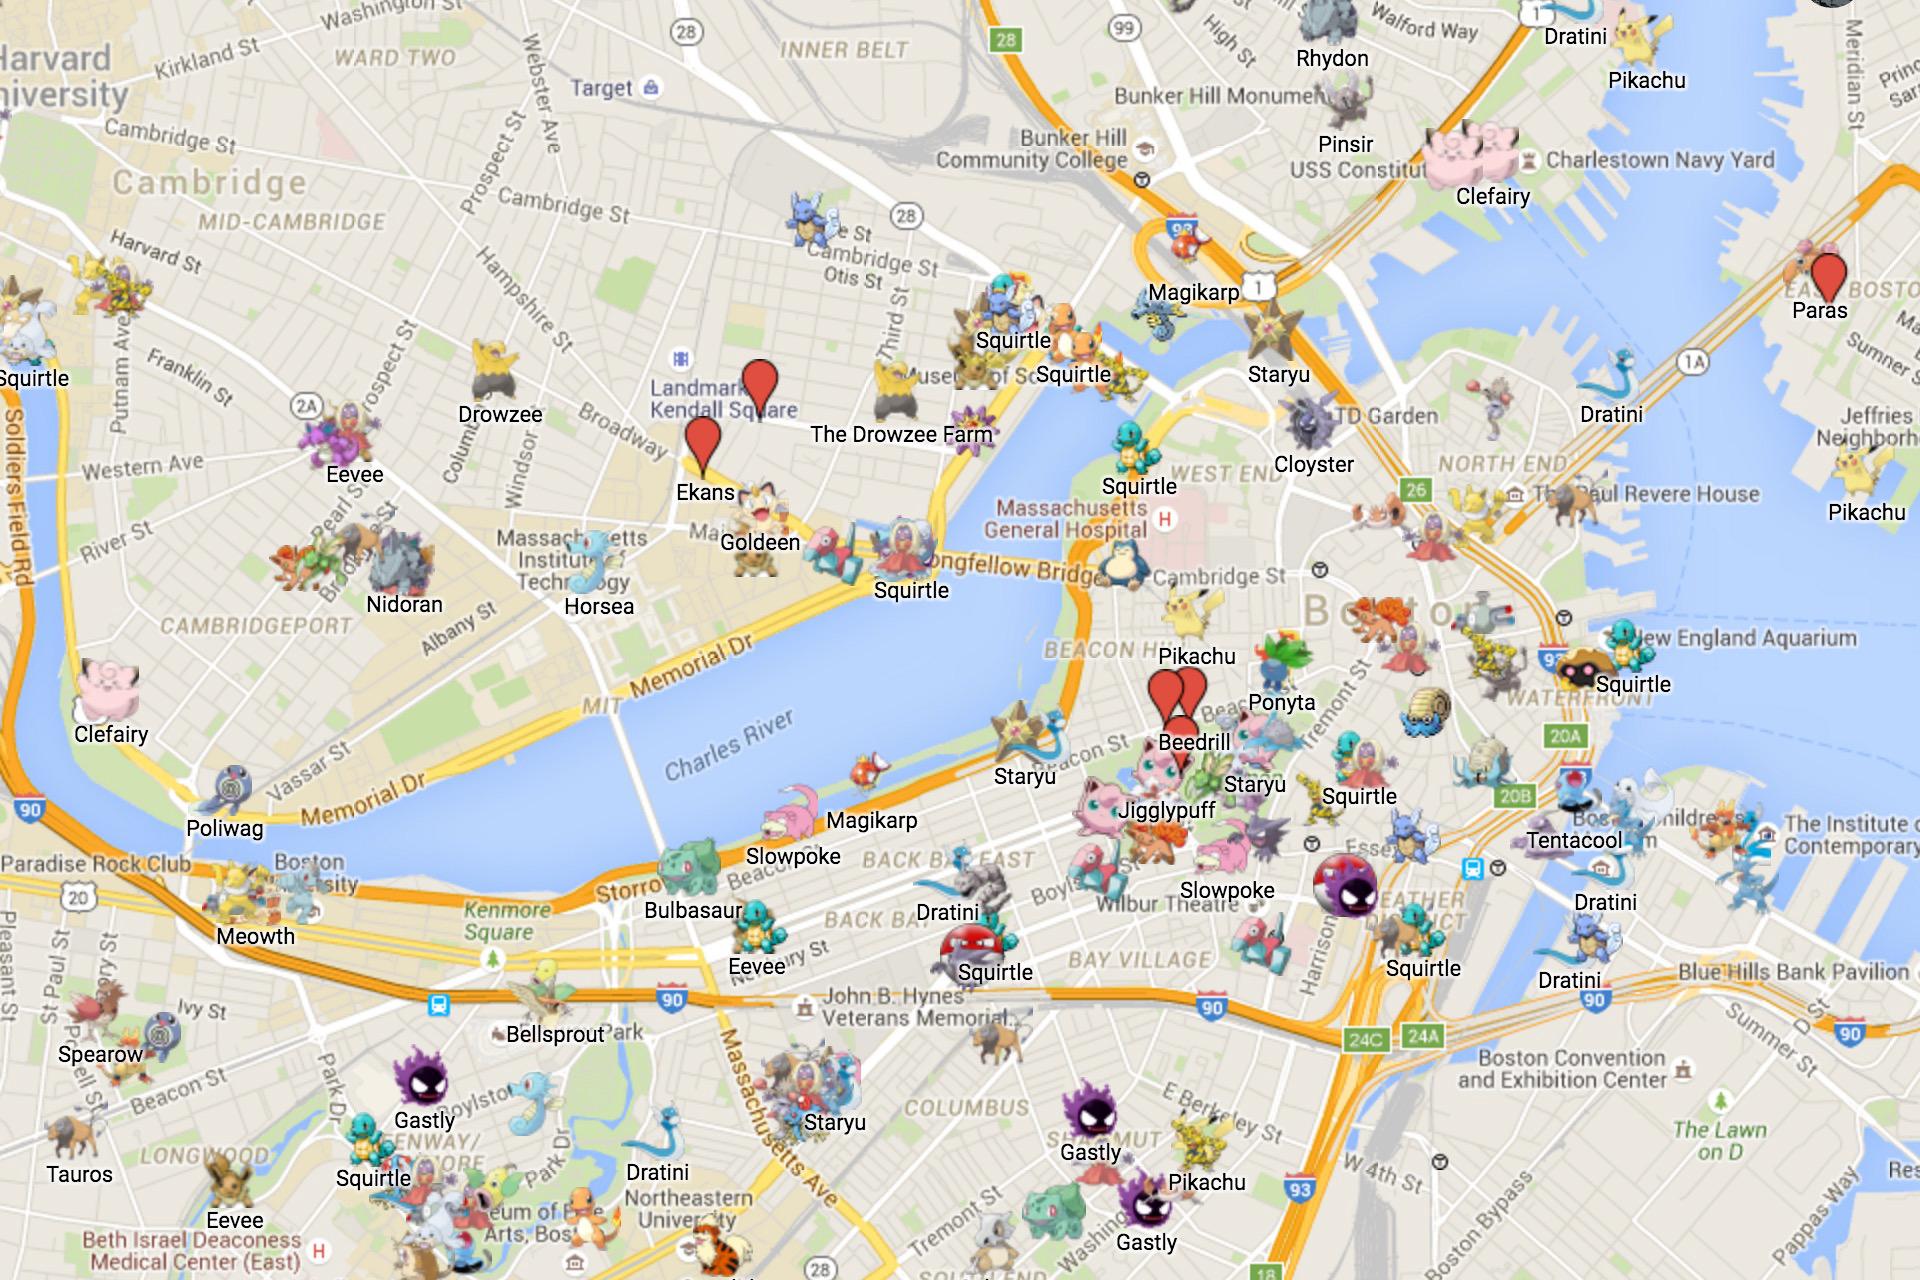 Looking for rare Pokémon? These maps might help,寶可夢,iv/cp值 2017 年 8 月 15 日 蘋果仁 PokemonGO 臺灣最多人使用的寶可夢地圖《大家找寶貝》以及《WeCatch》宣布關站, but use with caution